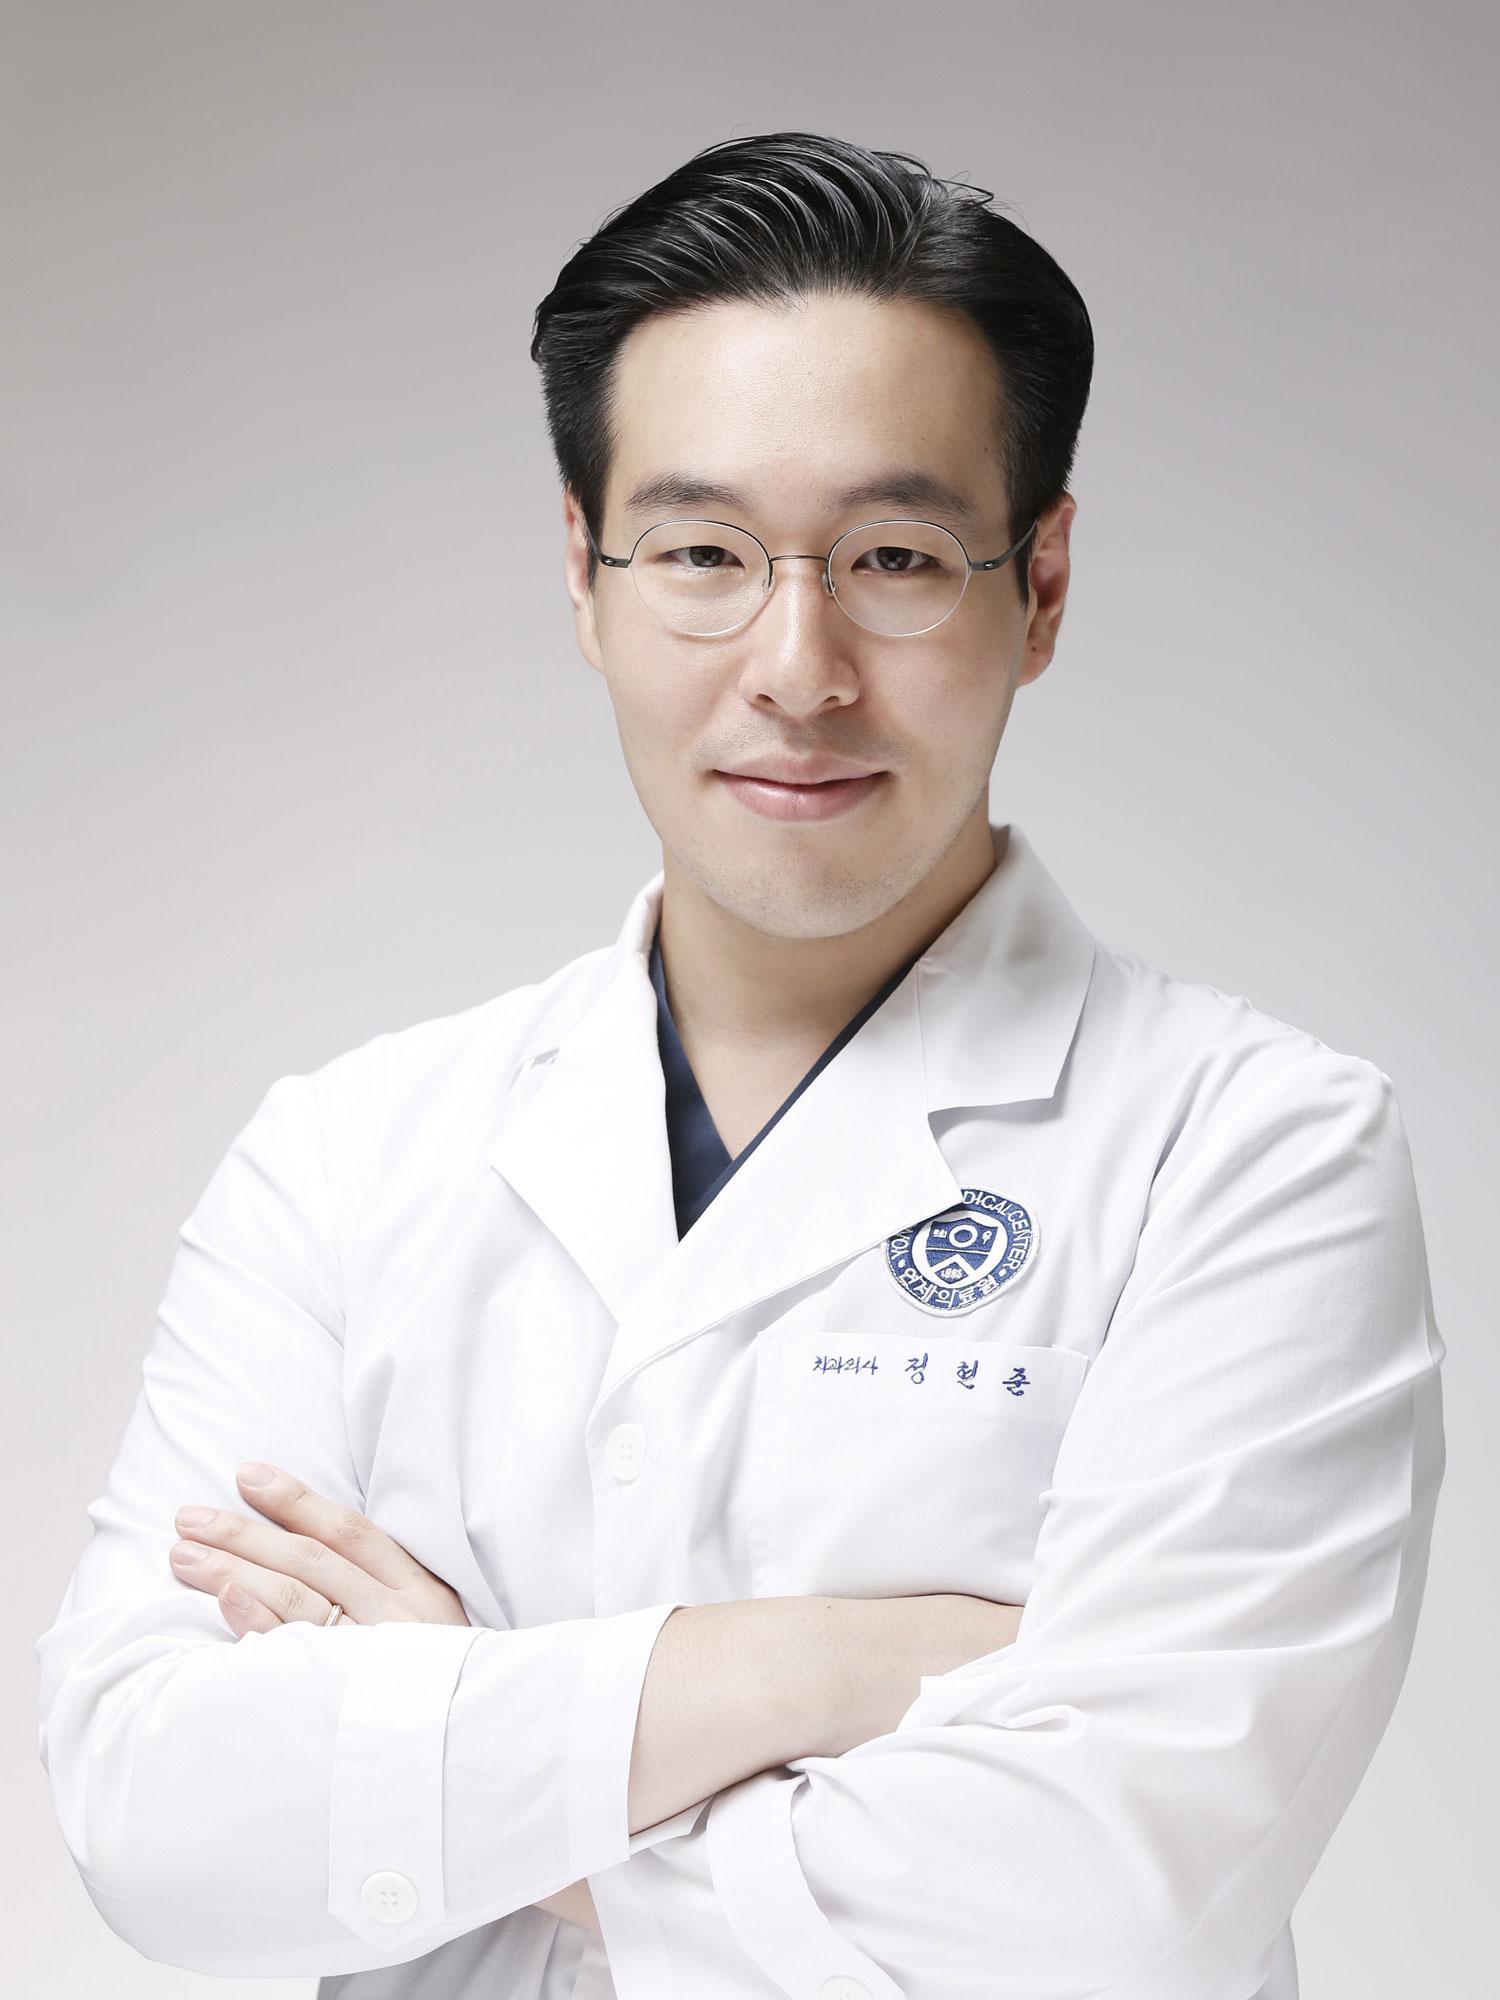 Dr. Hyun-Joon Chung